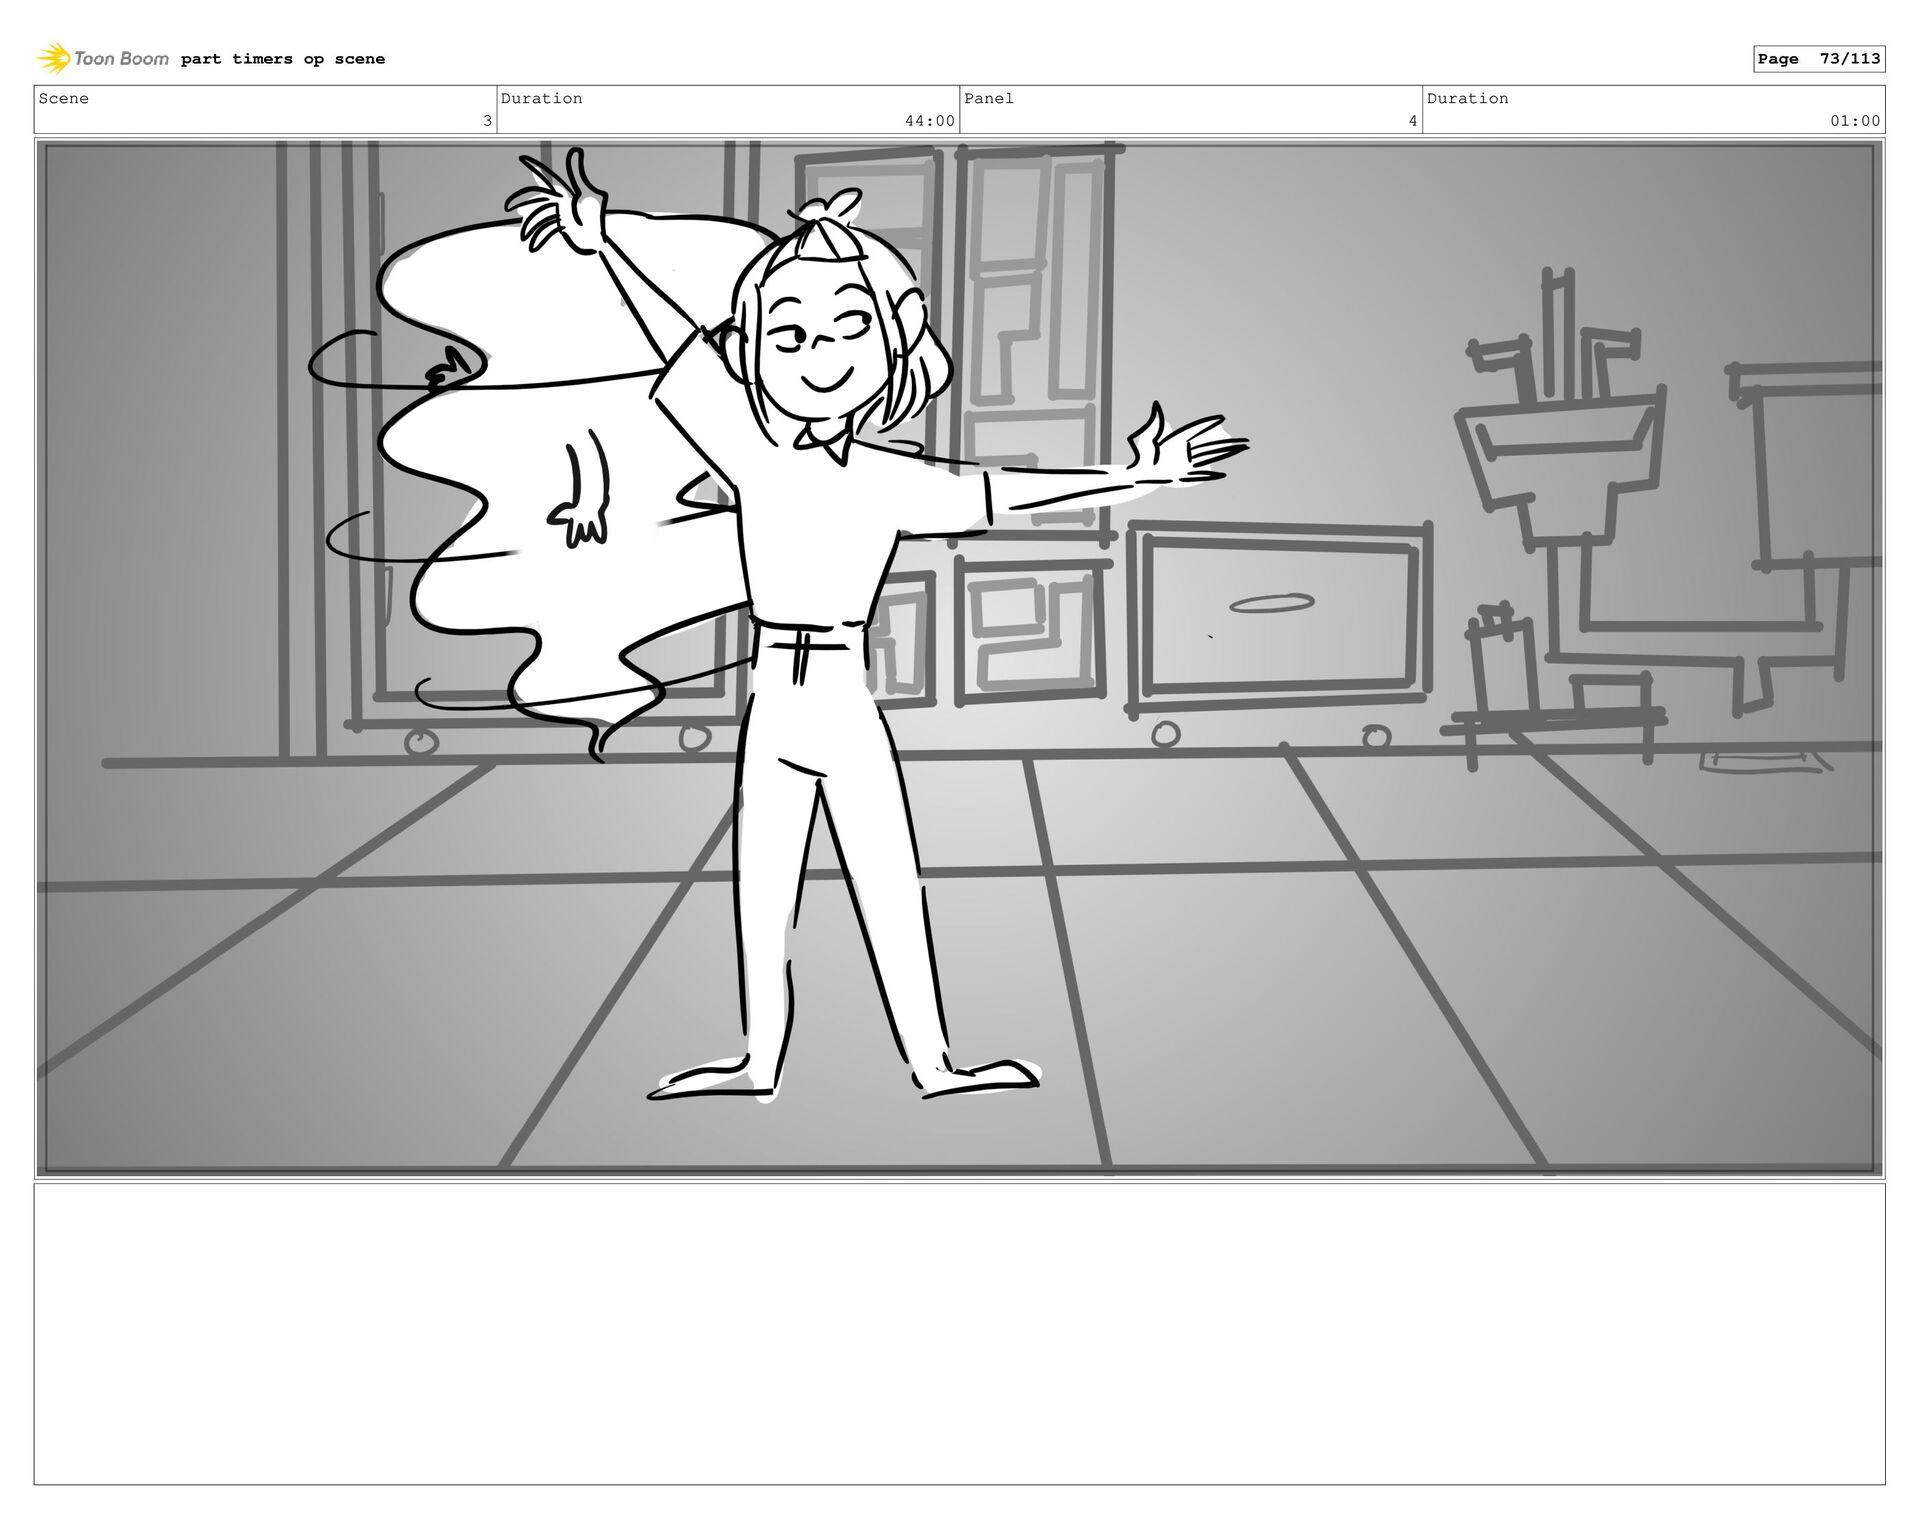 Scene 3 Duration 44:00 Panel 41 Duration 01:00 ...